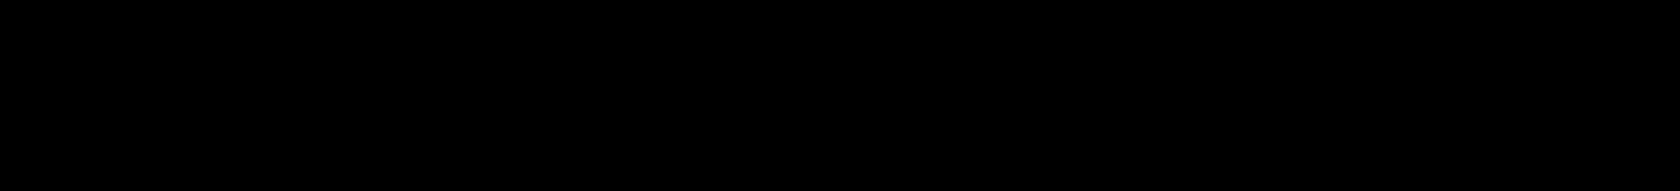 Korataki Light Italic